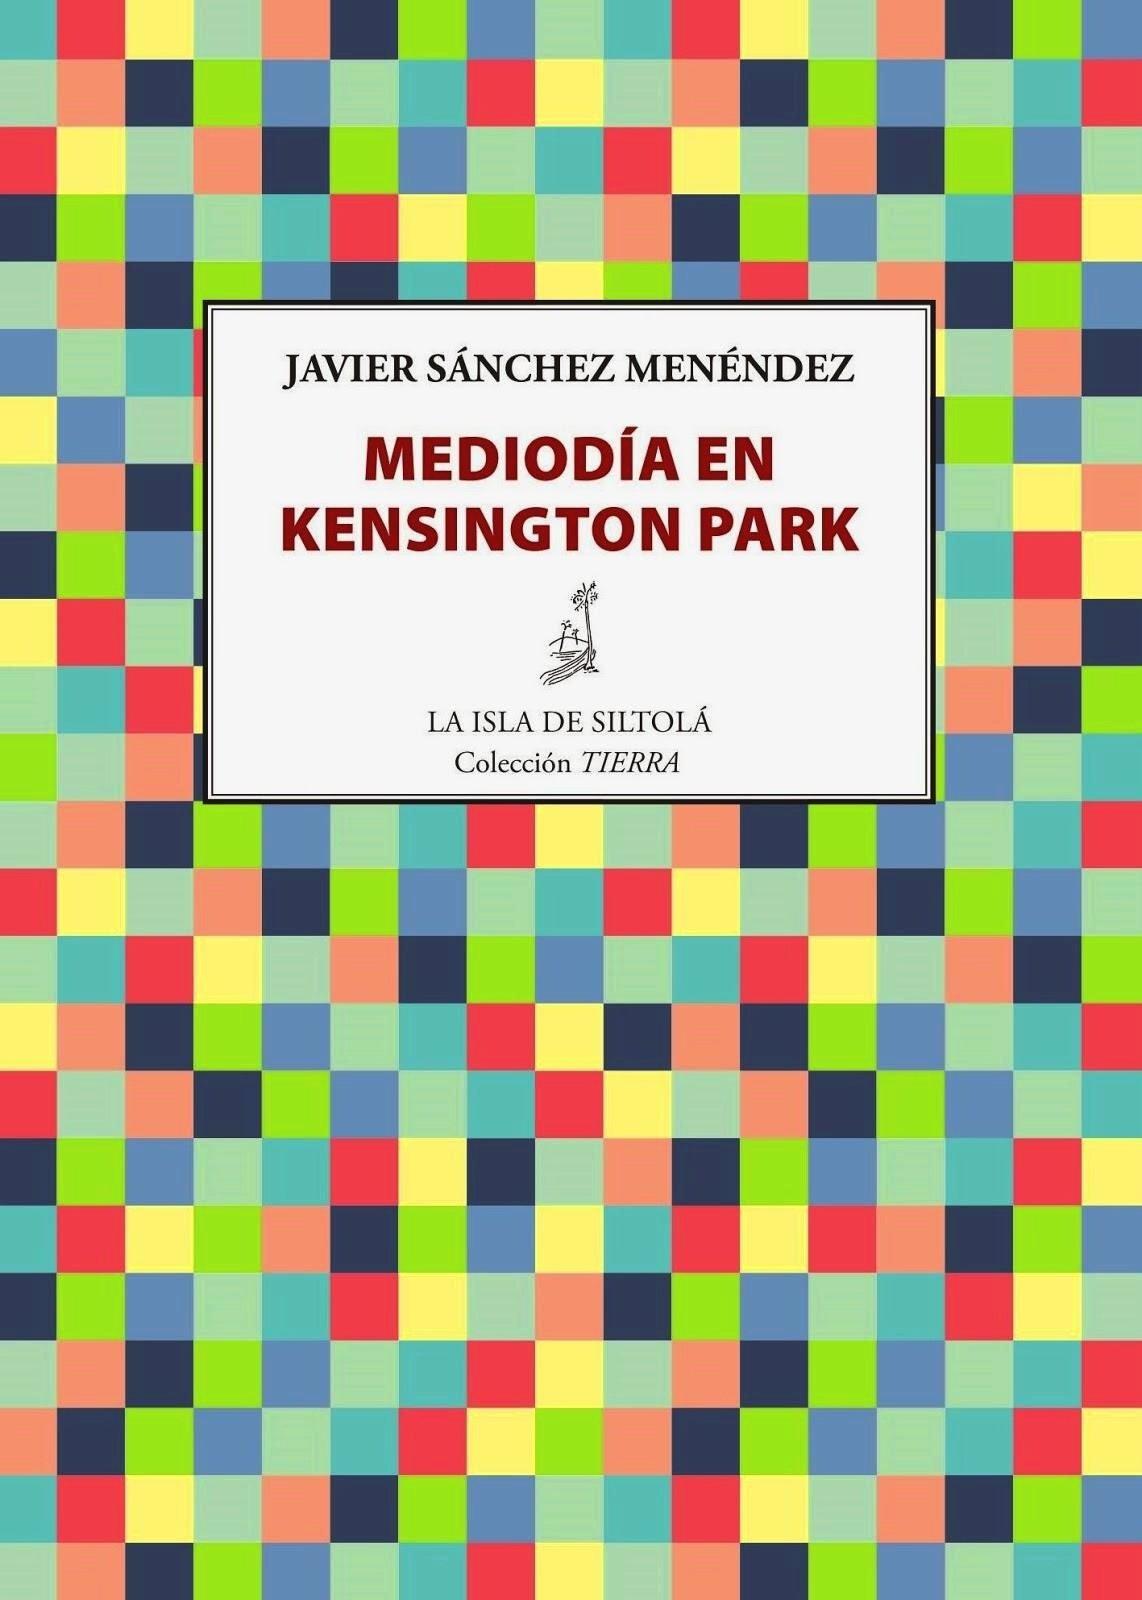 Mediodía en Kensington Park,  Javier Sánchez Menéndez